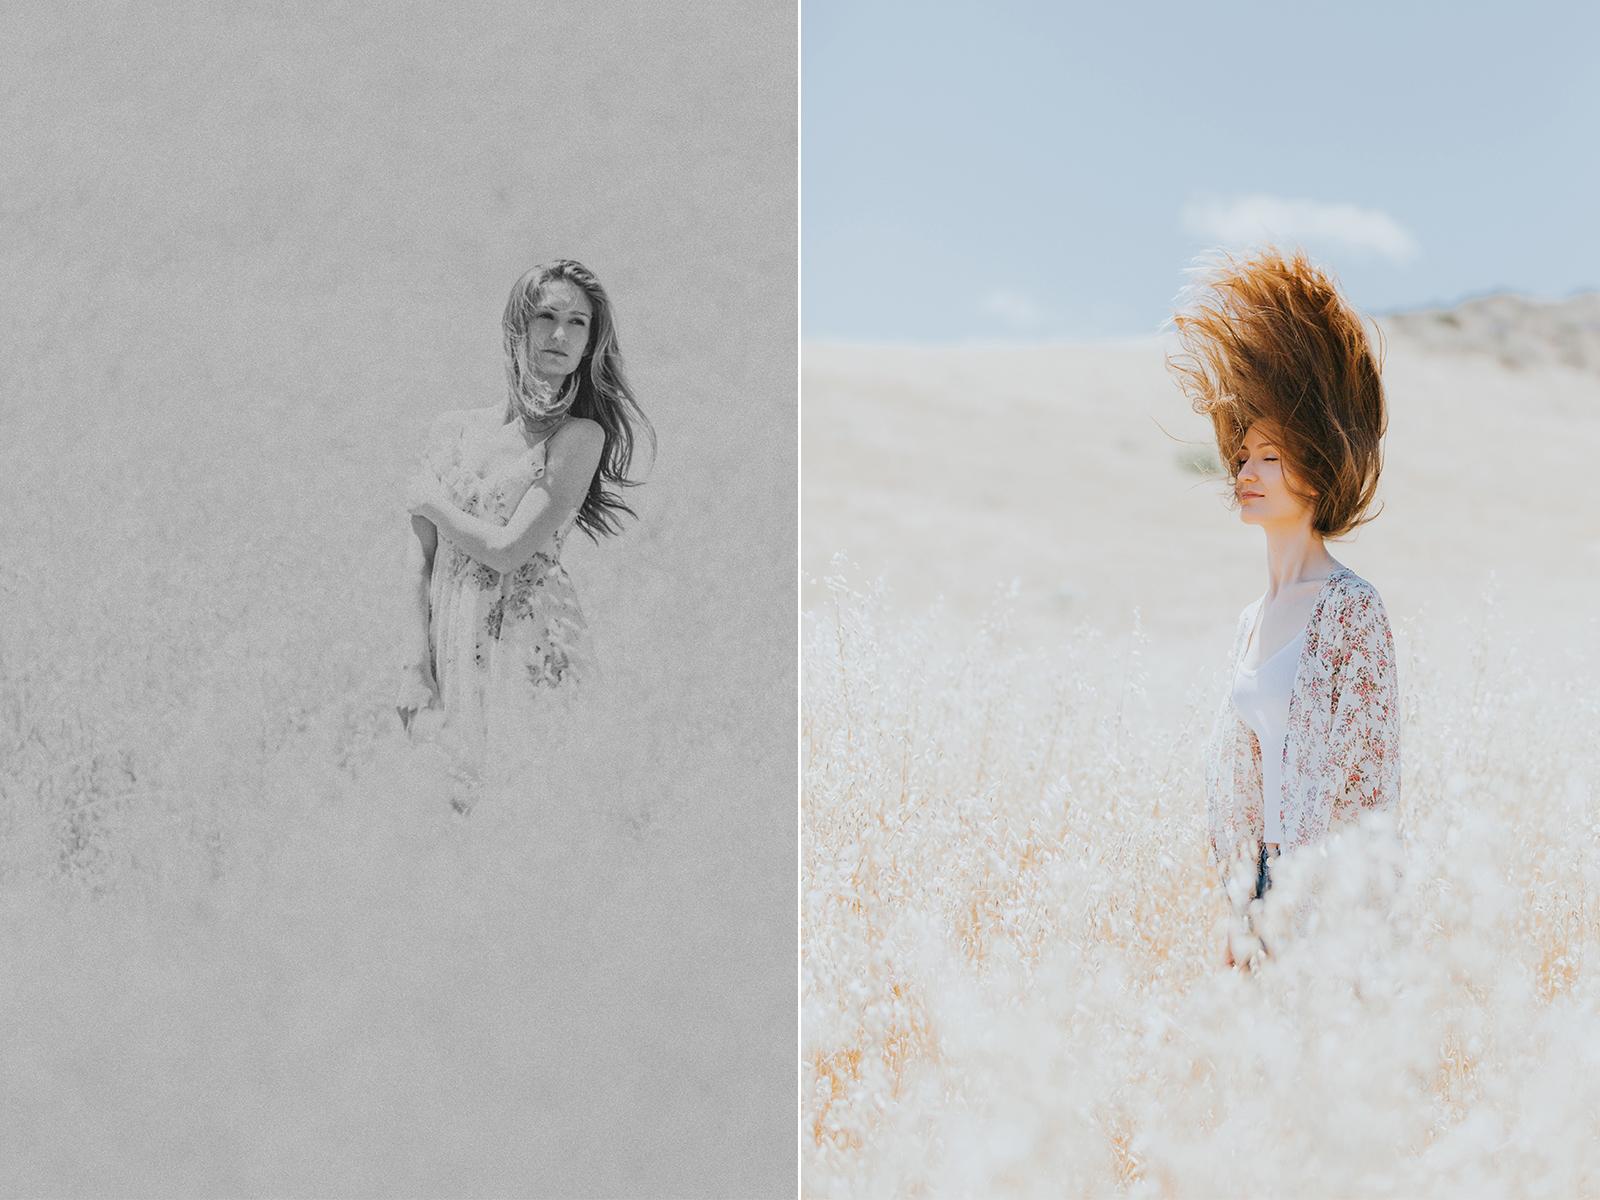 portrait-photographer-fields-orange-county-ca-hannah-4